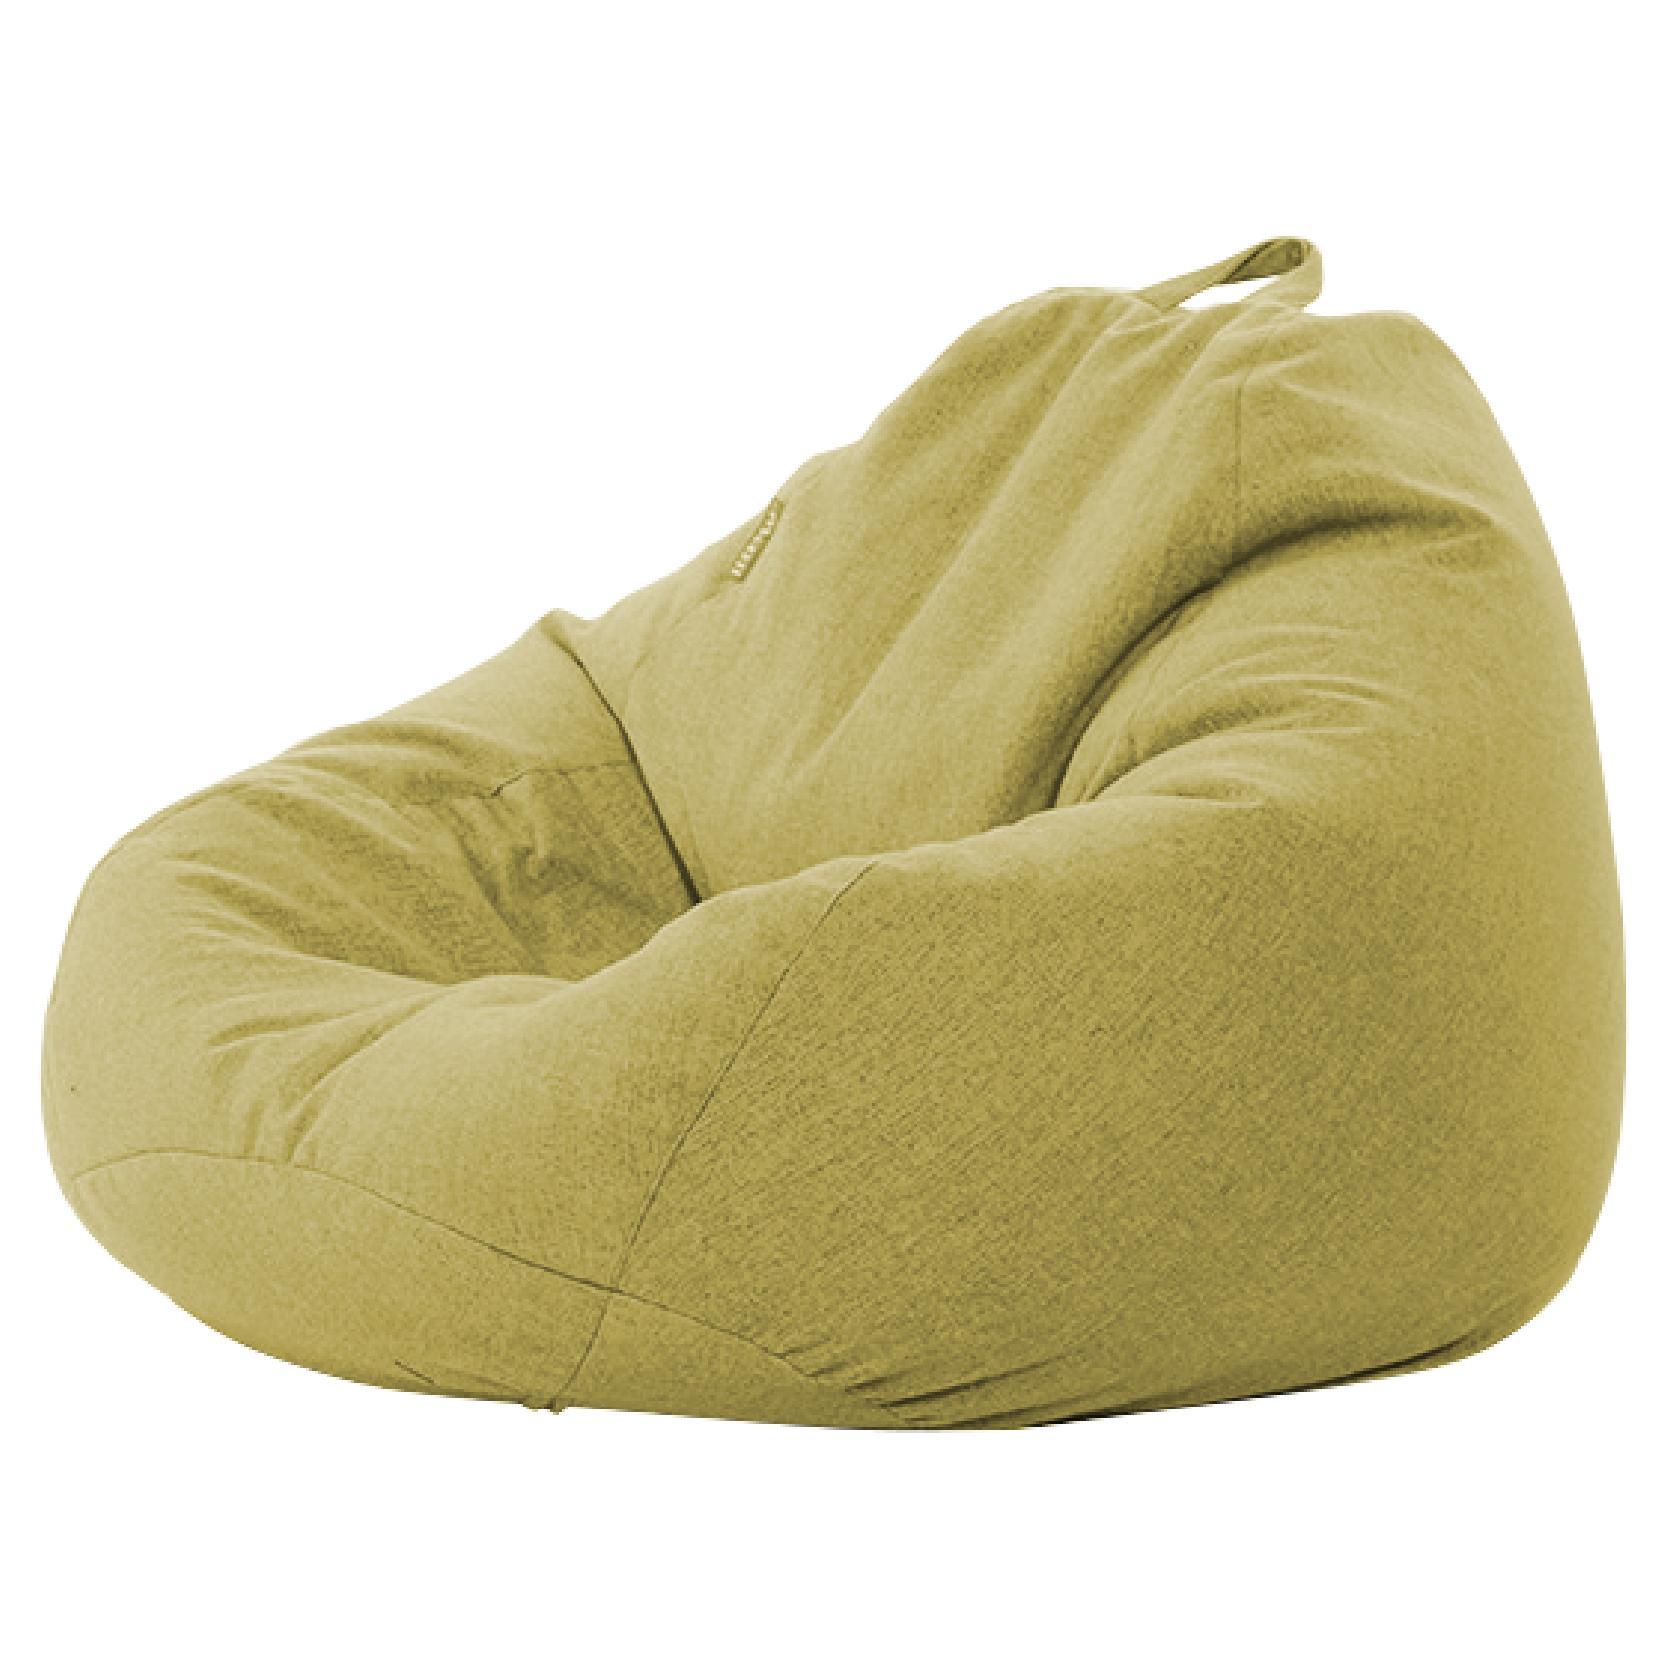 JIJI Nami Bean Bag Size : 90 X 110CM (Bean Bag) - - Beanbag/ Bean bag Chair /Styrofoam particles filled/ Fabric outer layer/ Washable / small sofa (SG)